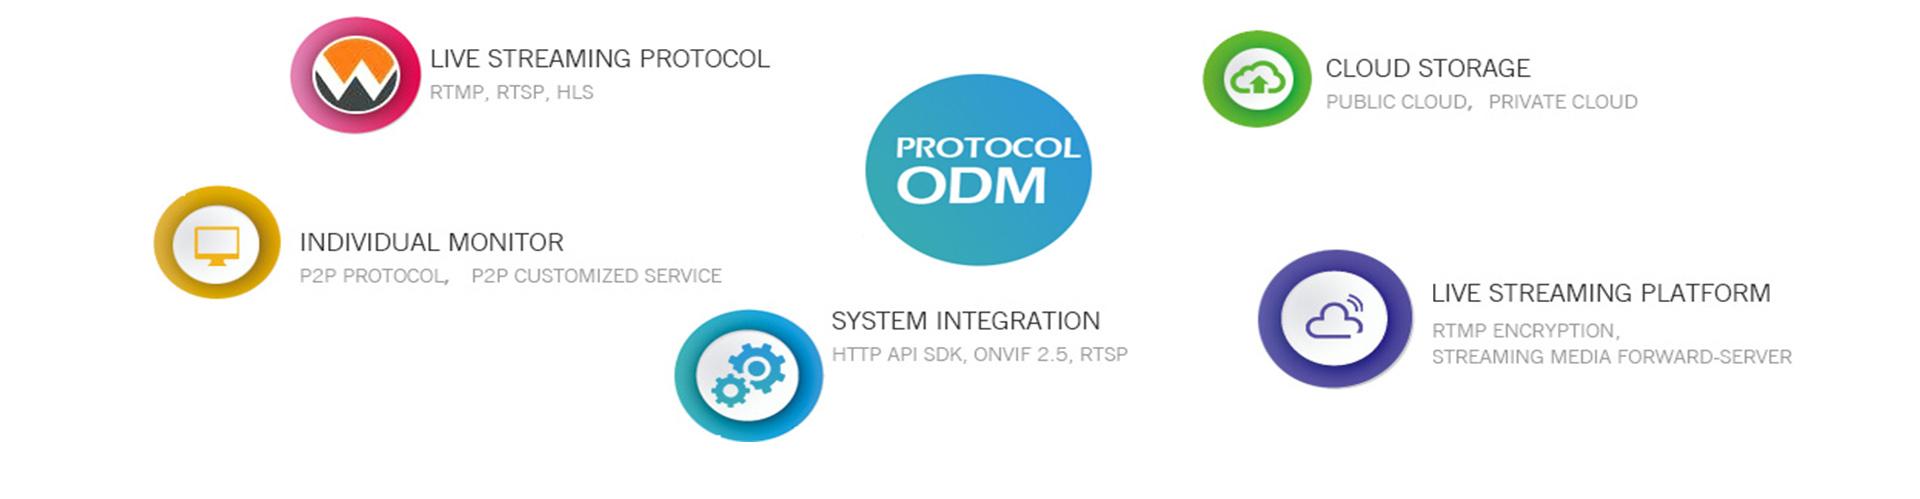 wifi-camera-protocol-odm-rtmp-rtsp-onvif